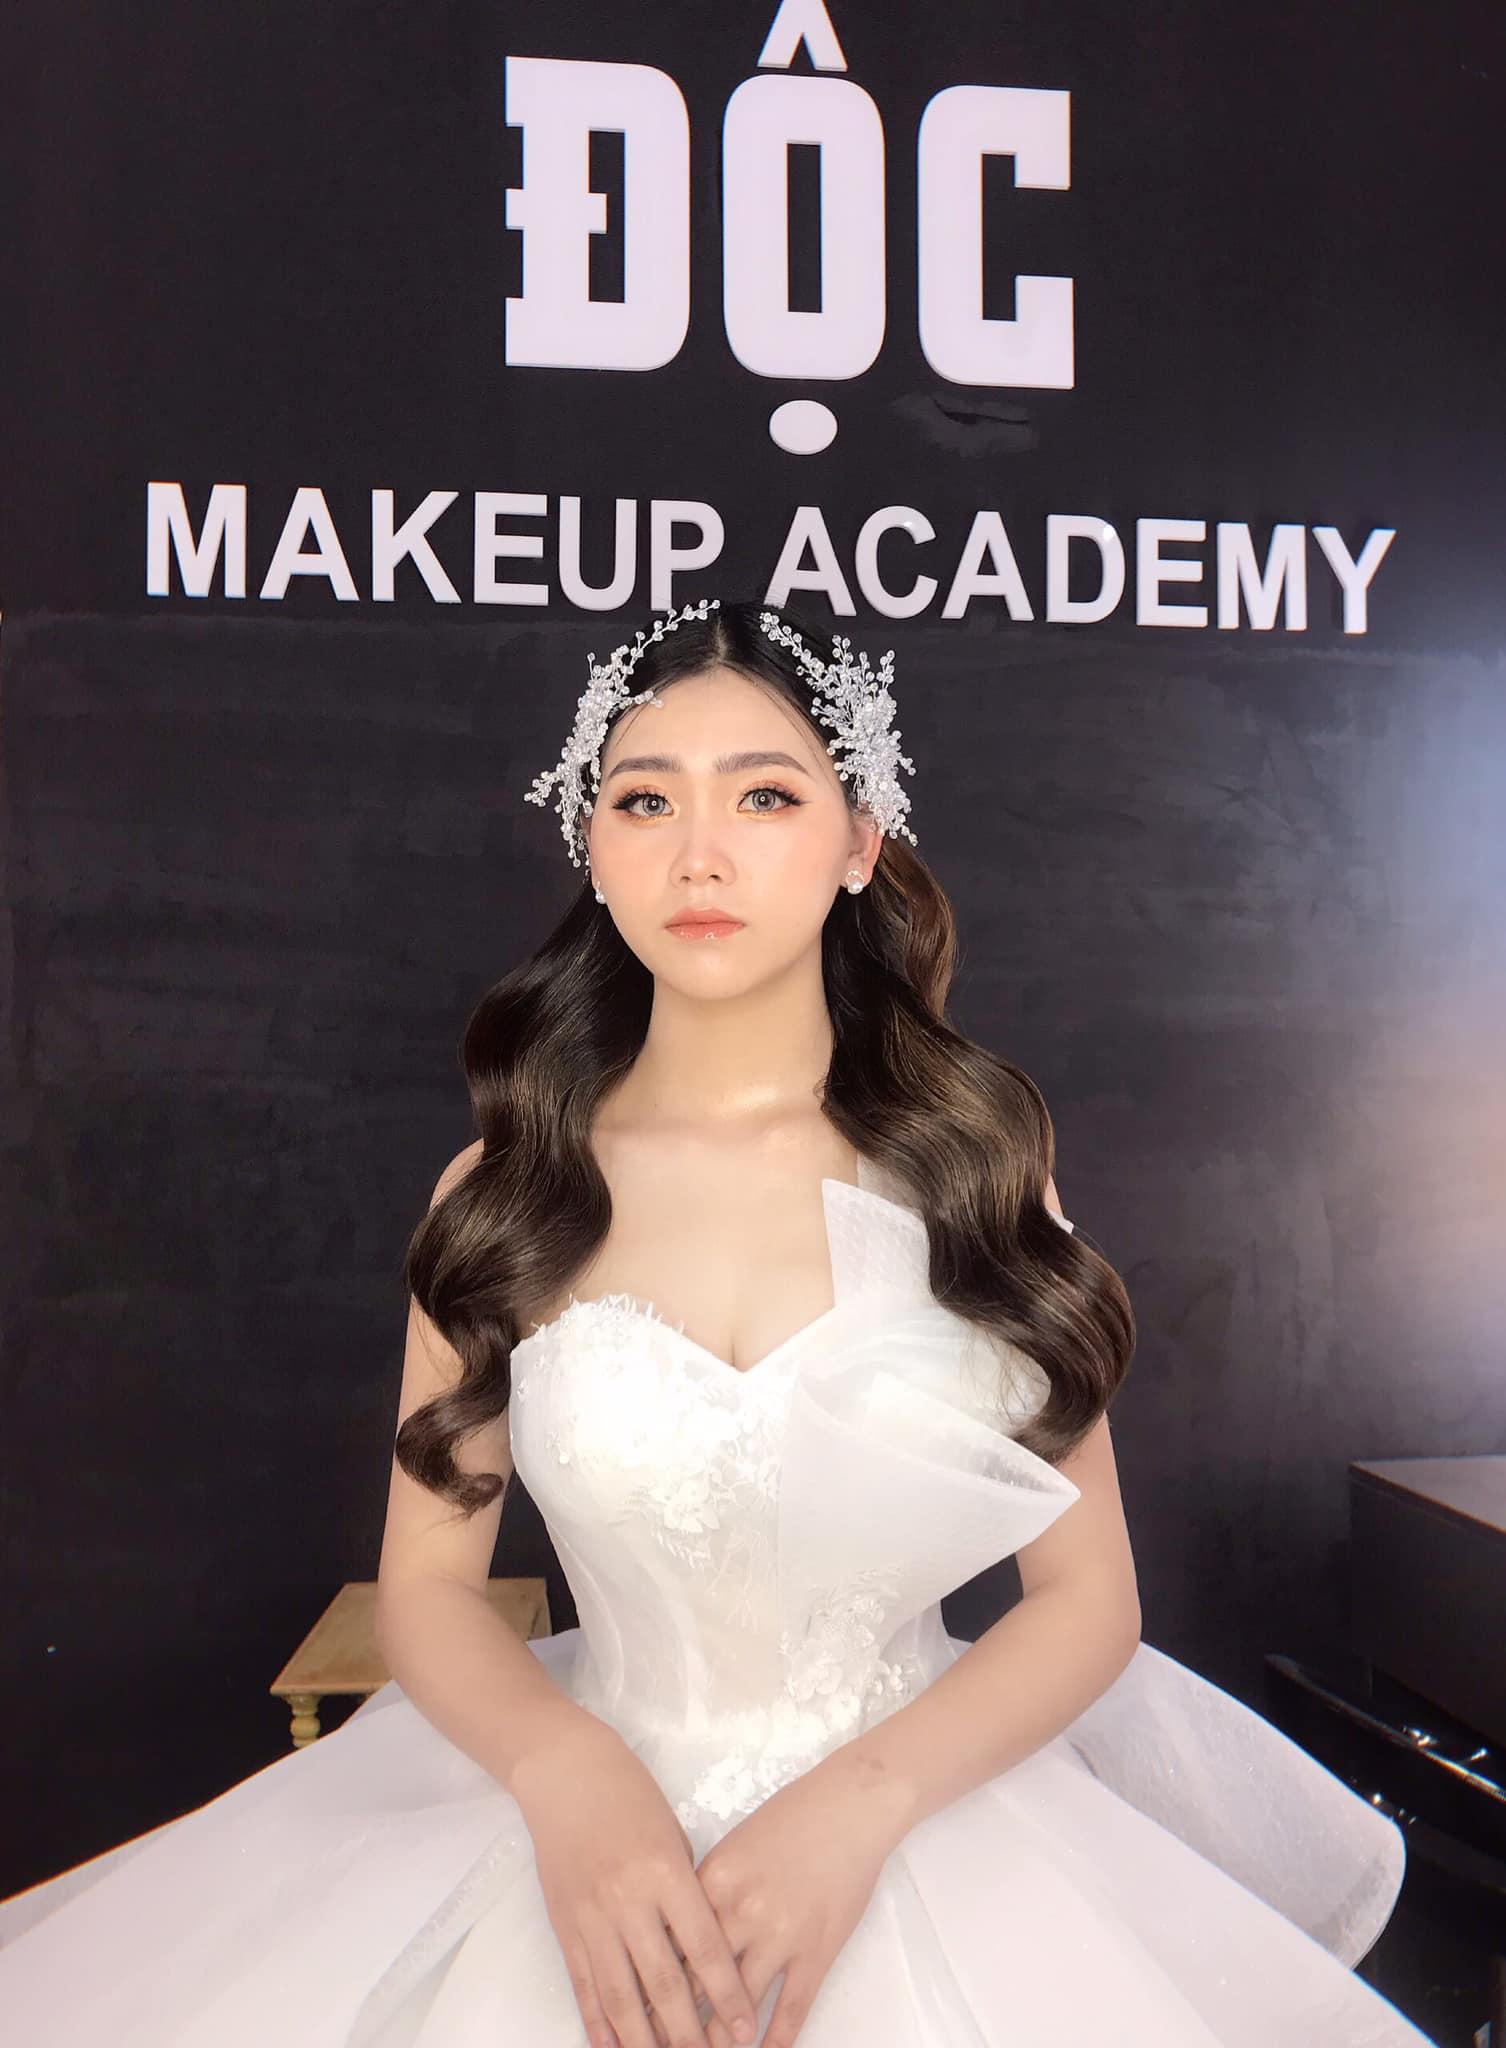 Độc Makeup Academy